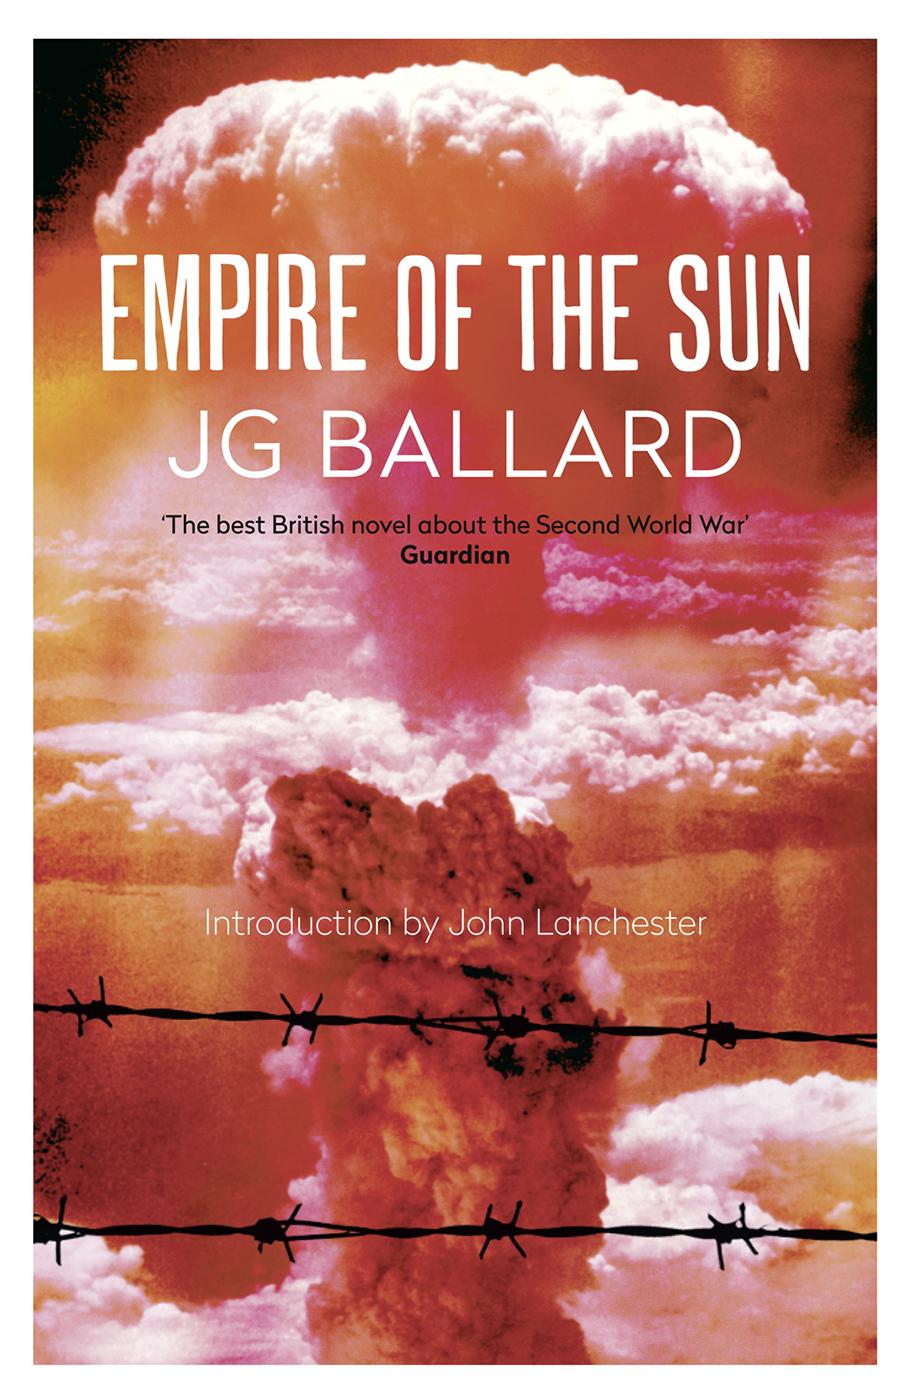 цена на John Lanchester Empire of the Sun